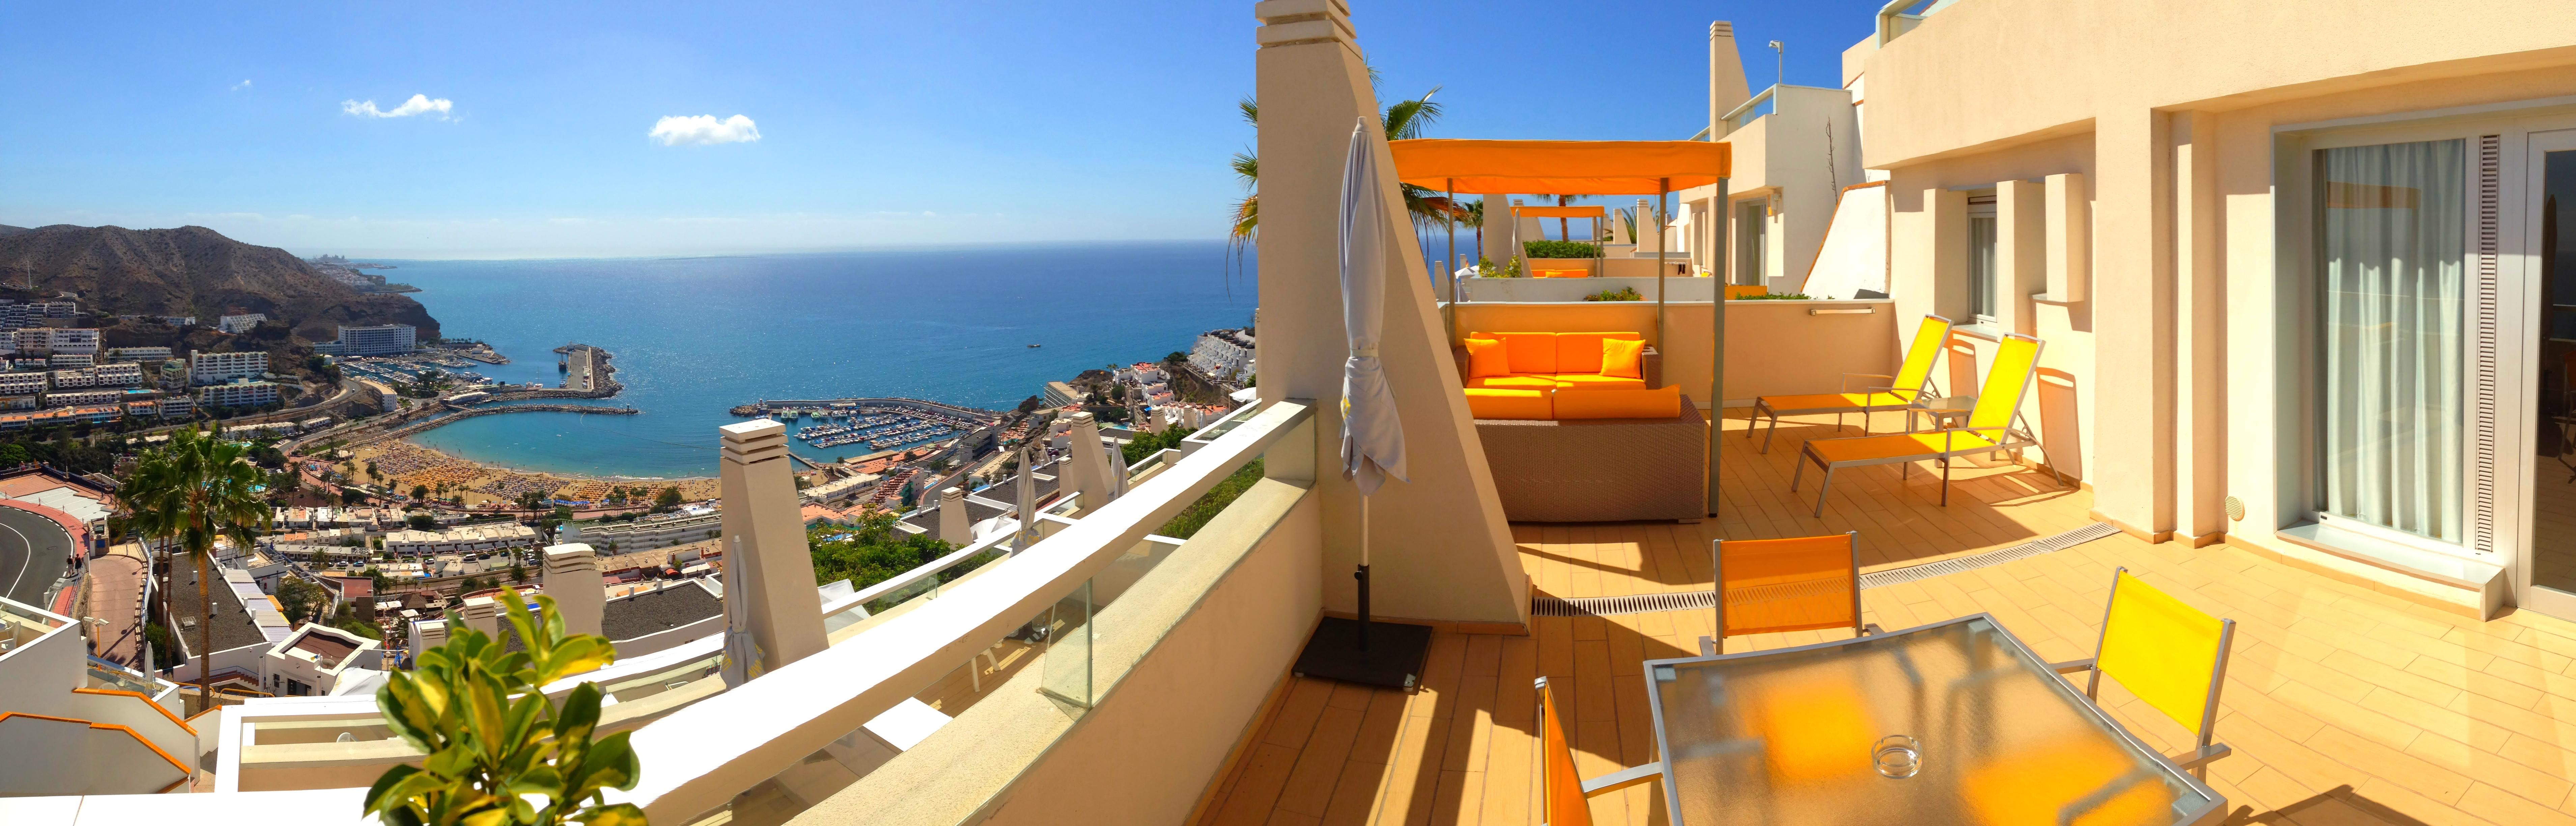 Gran Canaria Hotel Princeb Tabaiba